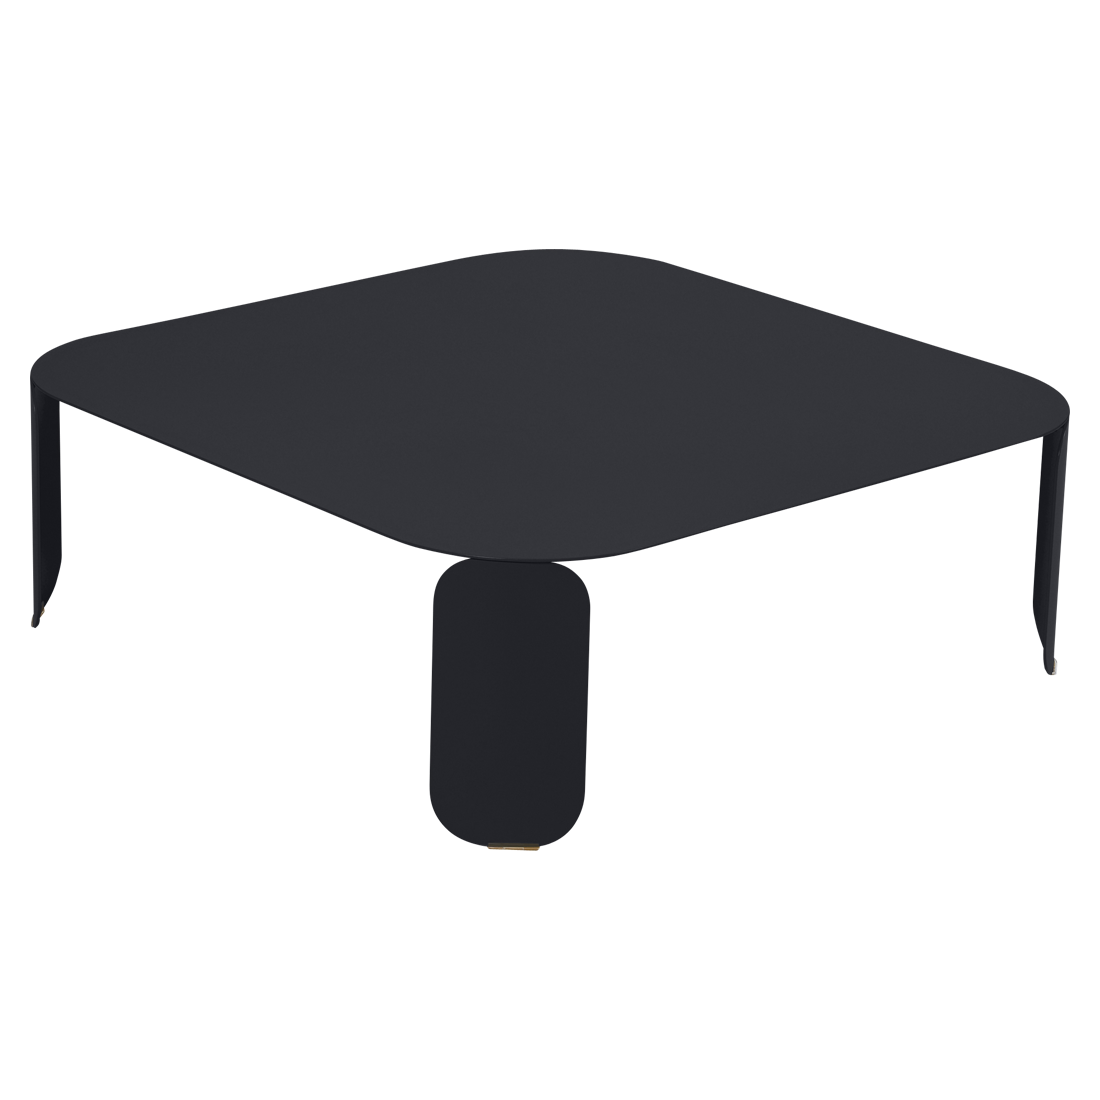 table basse metal, table basse design, table basse fermob, table basse lohner, table basse noir